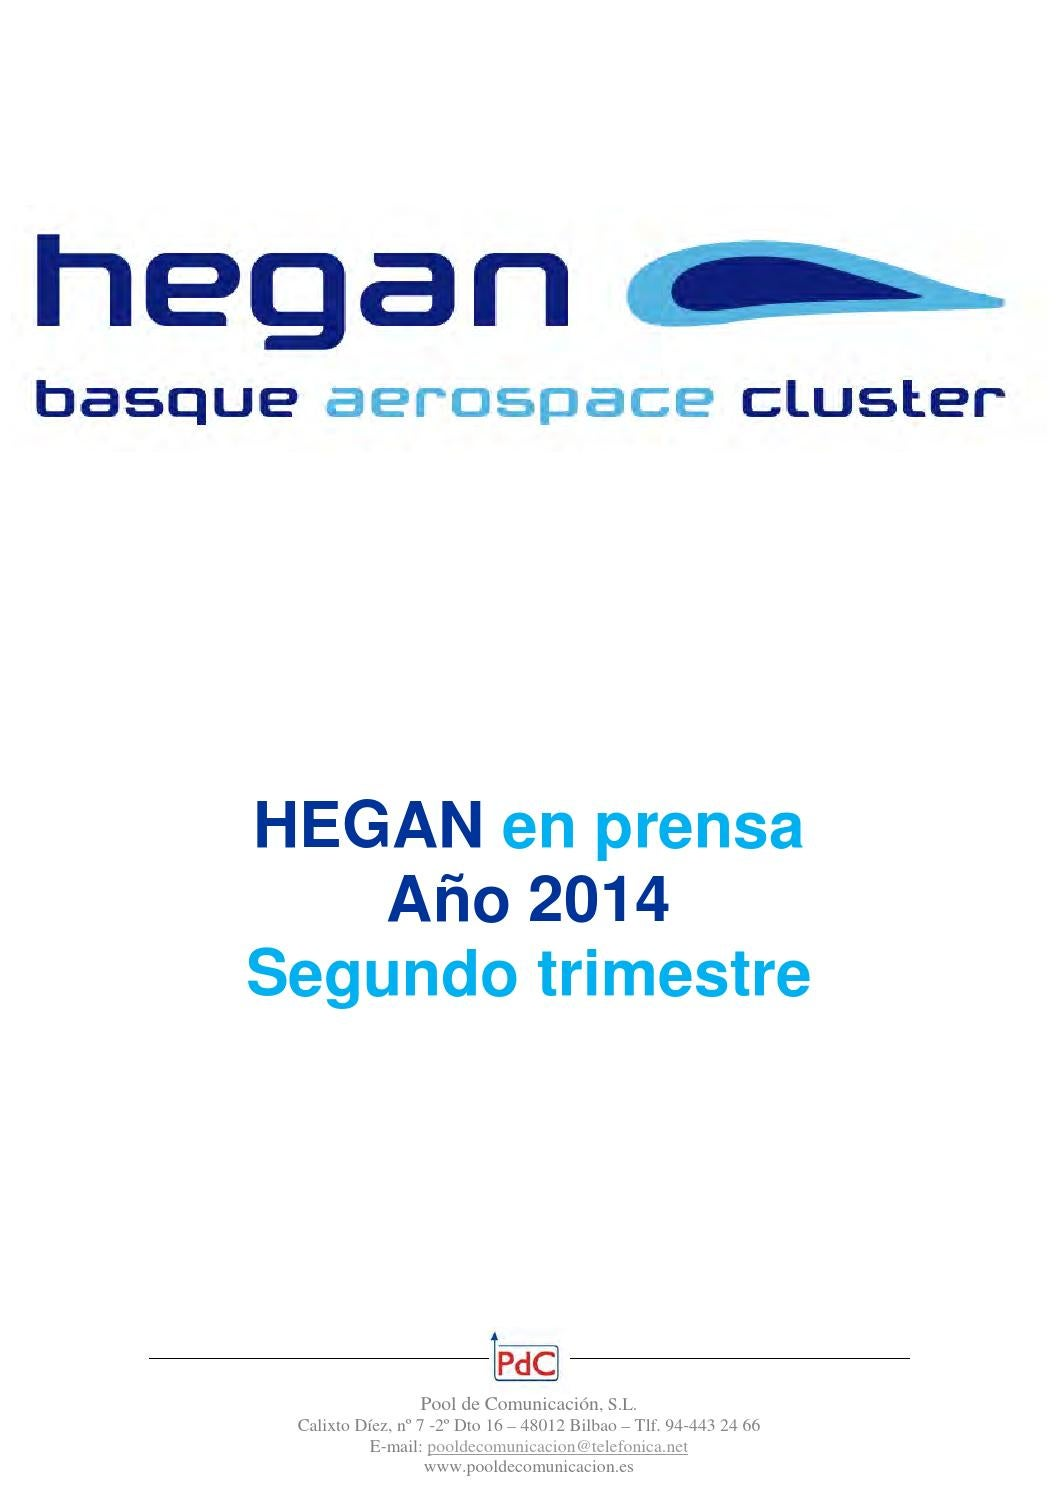 Hegan en prensa segundo trimestre 2014 by Hegan Cluster - issuu